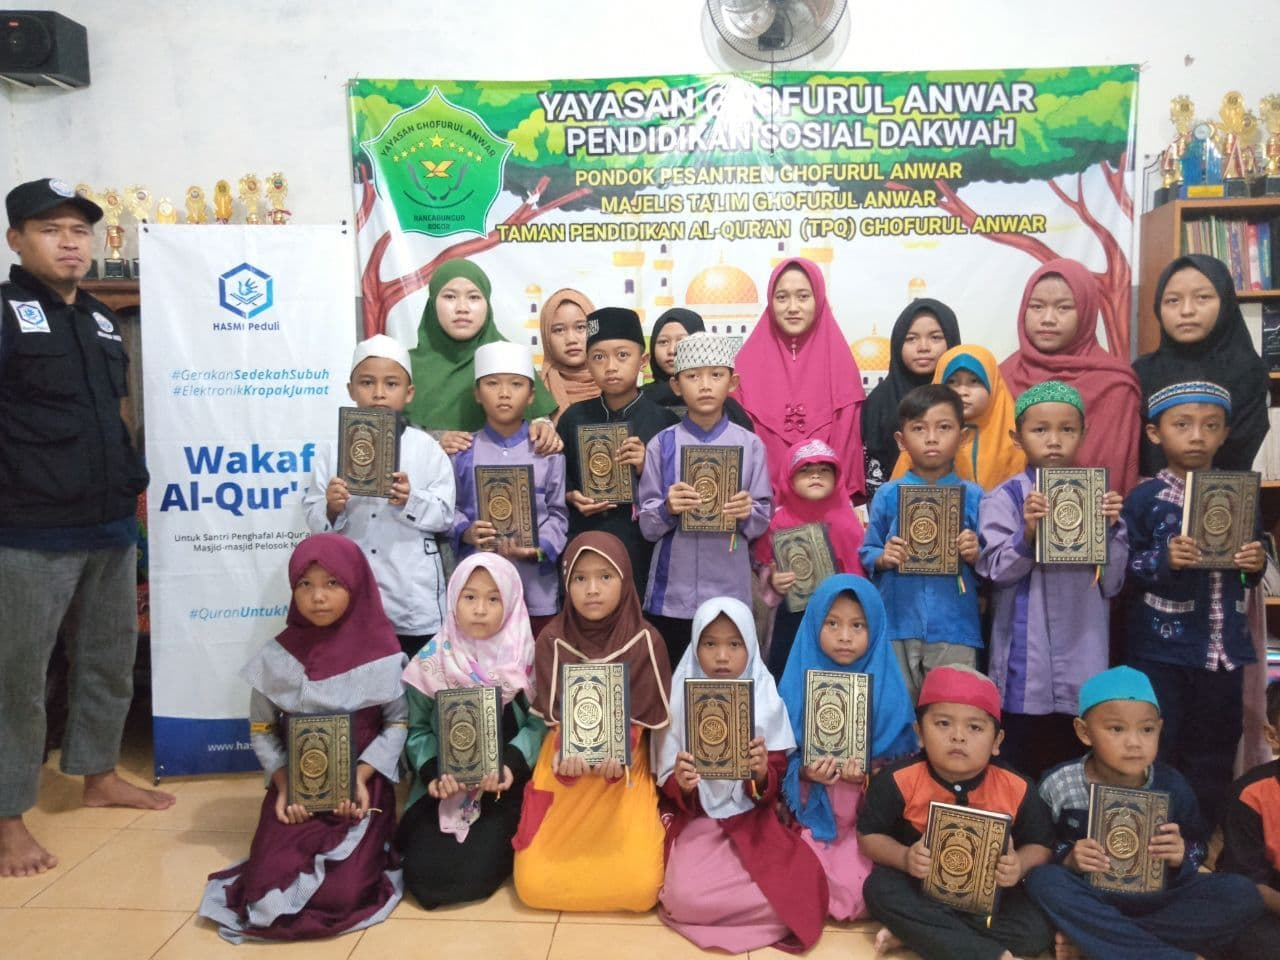 Distribusi Mushaf Al-Qur'an ke Ponpes Ghofurul Anwar Bogor